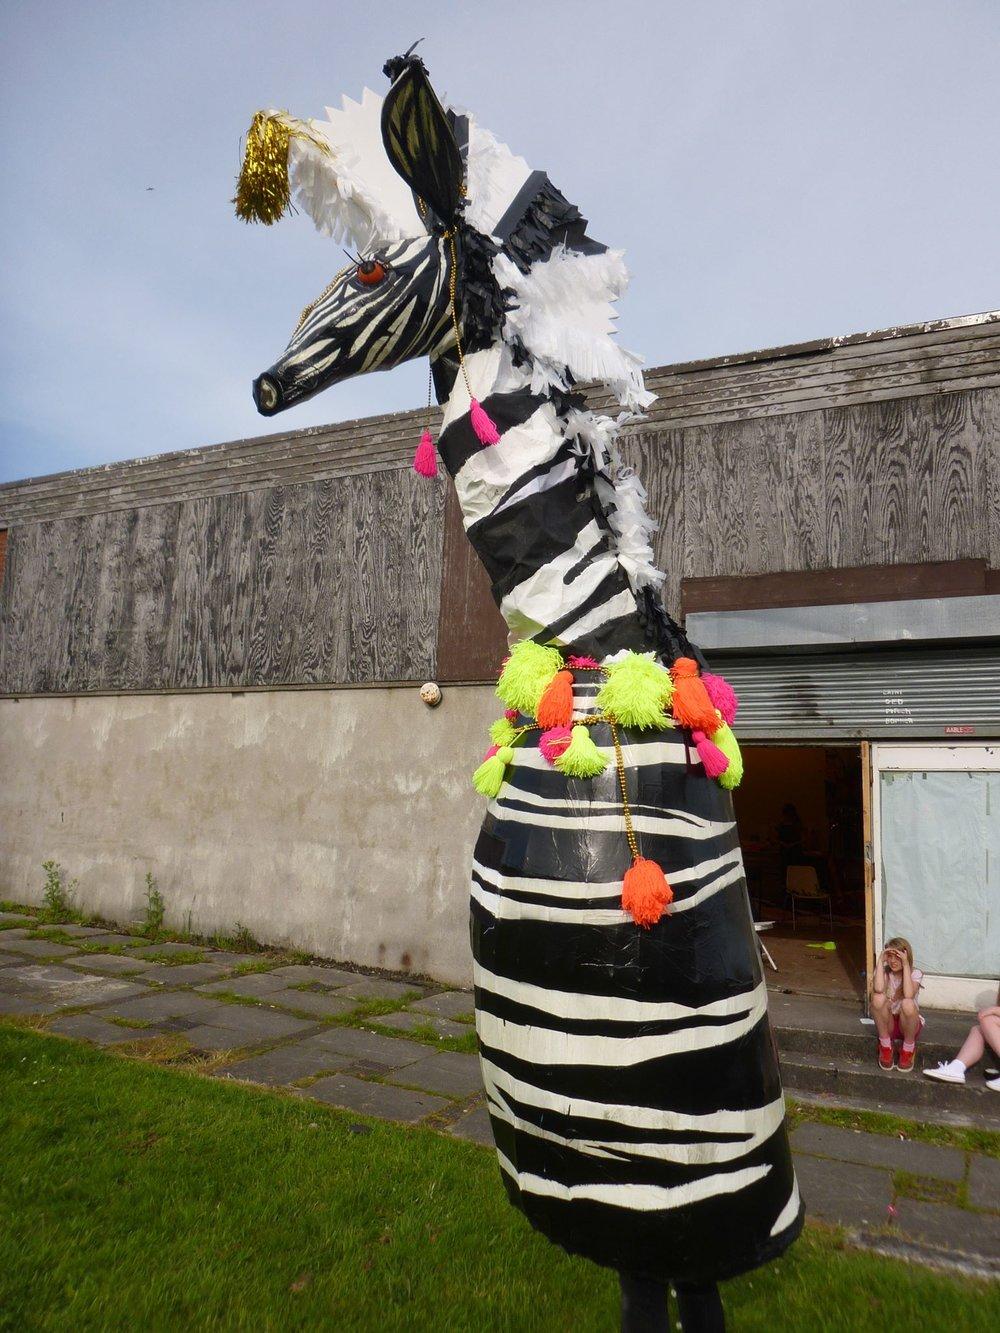 Platform carnival parade wild extendable zebra